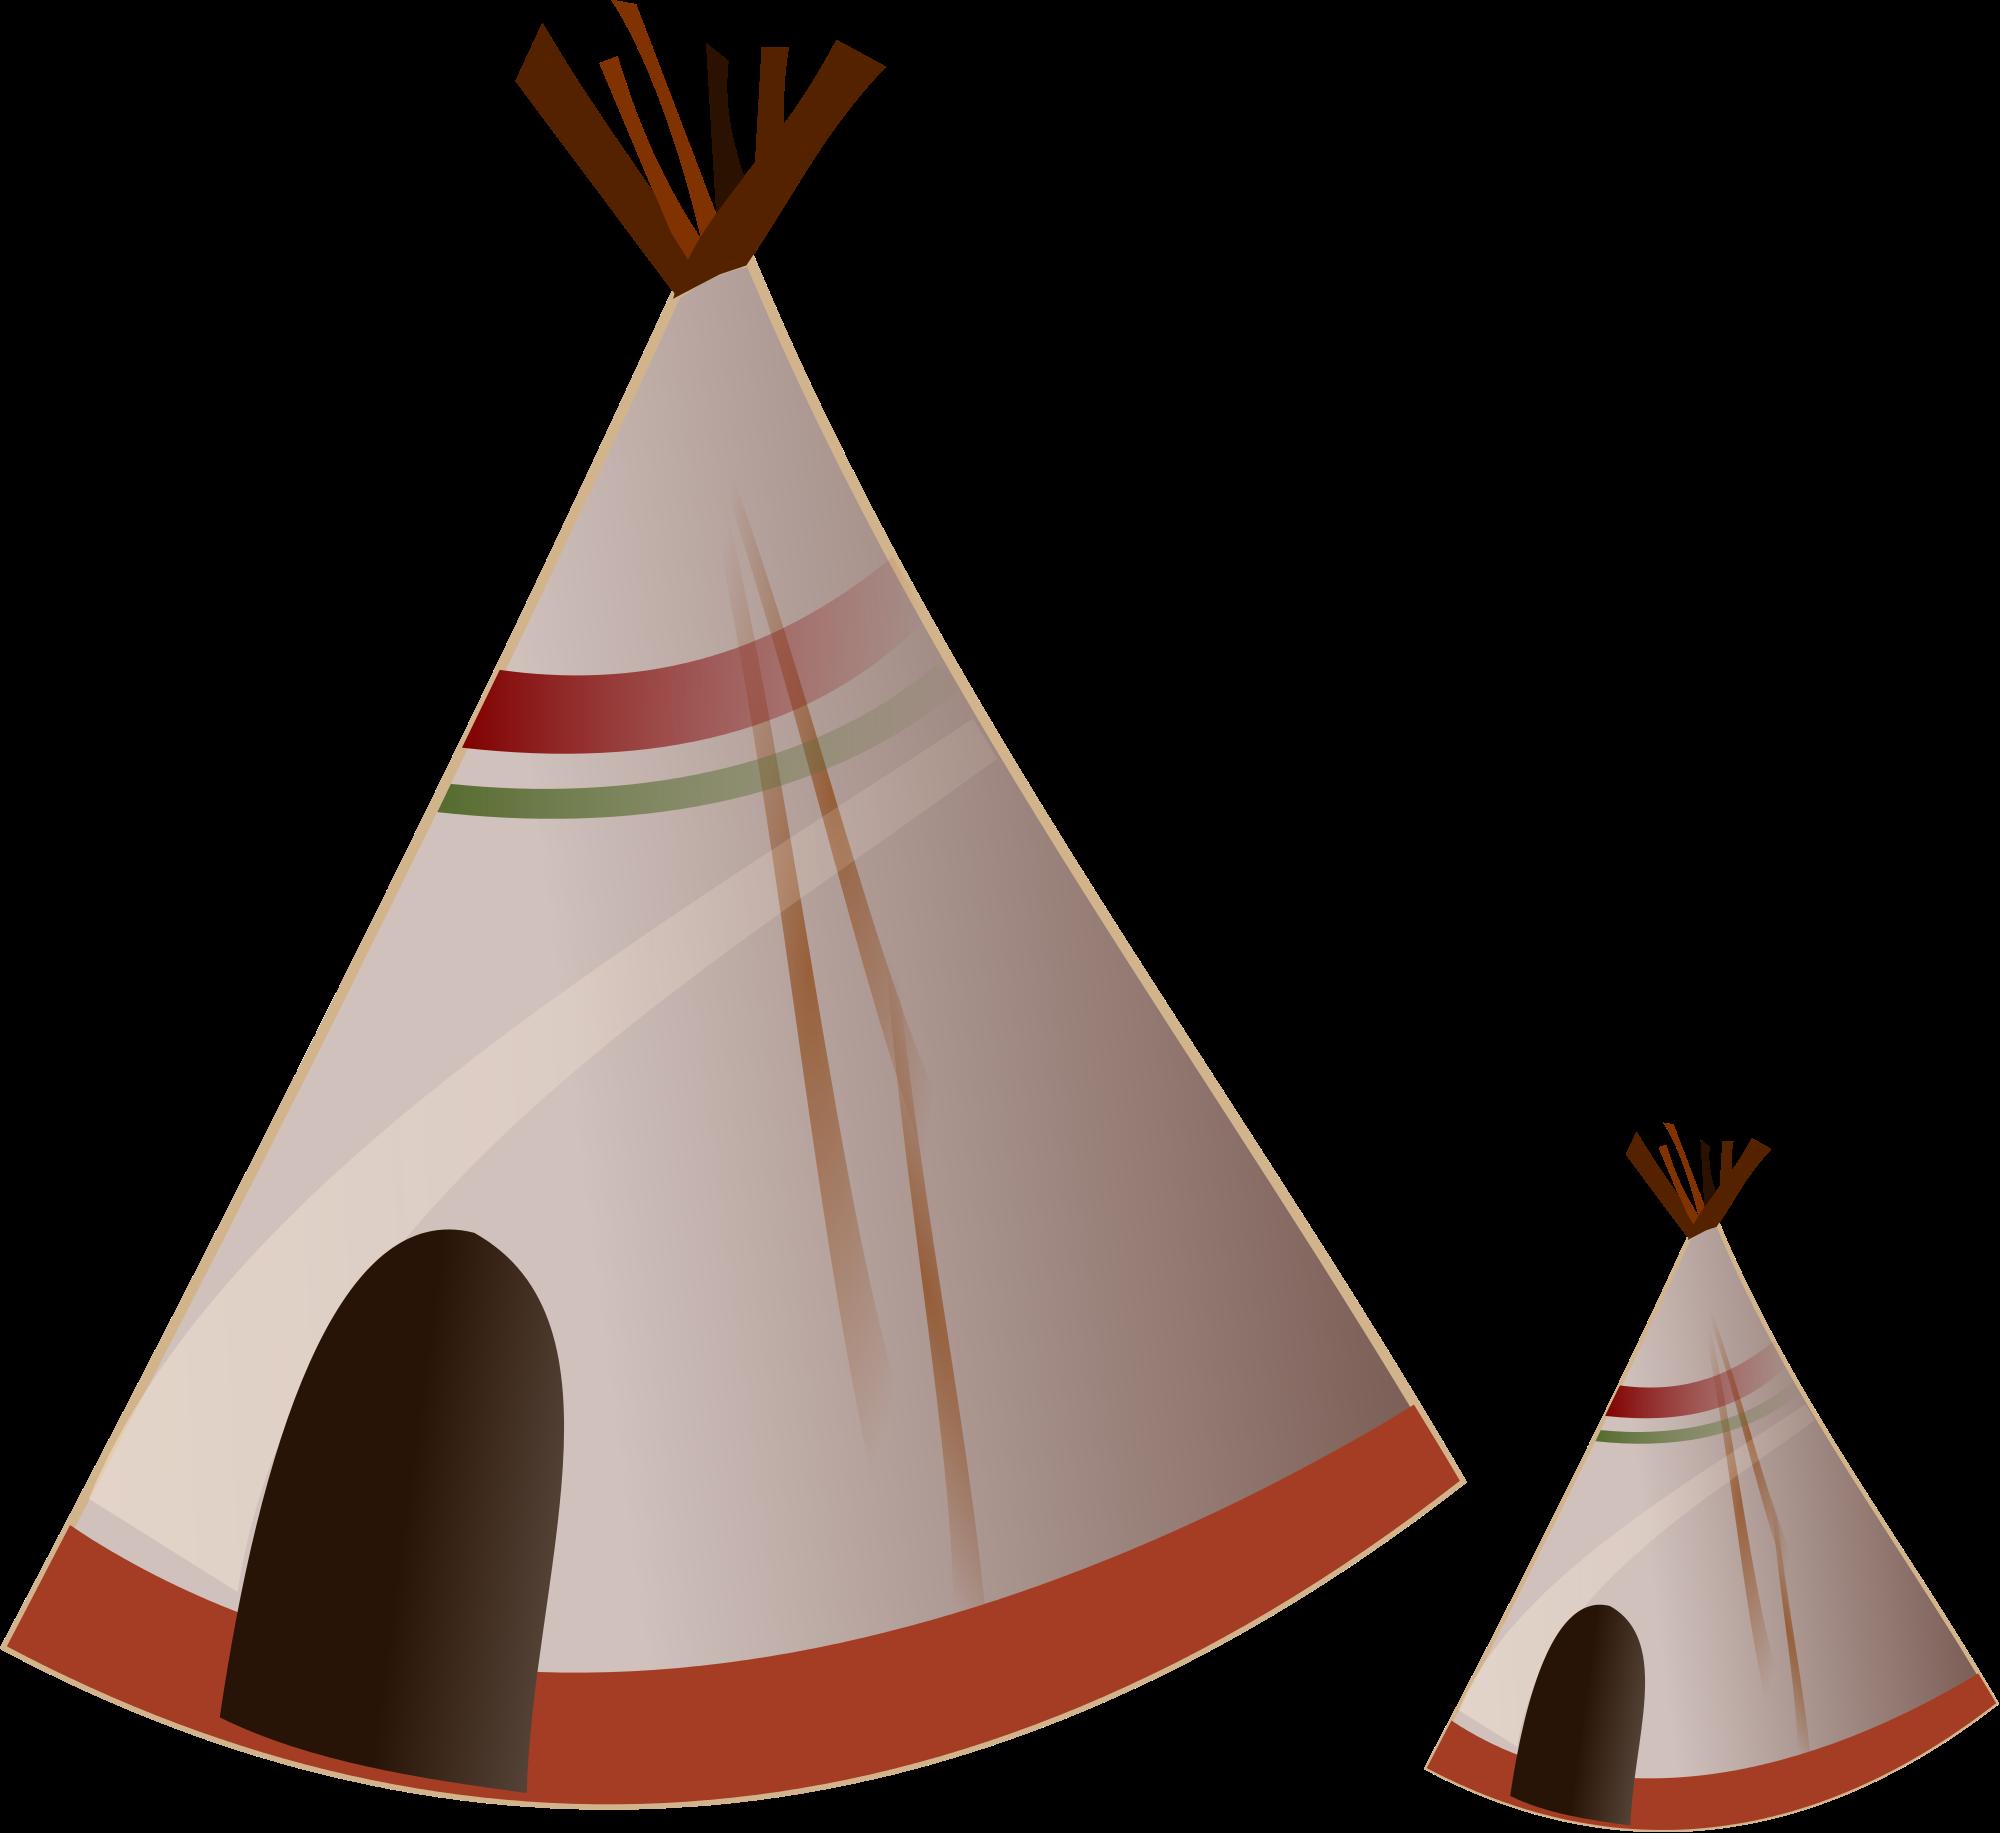 File logo tipi indien. Clipart tent hut indian